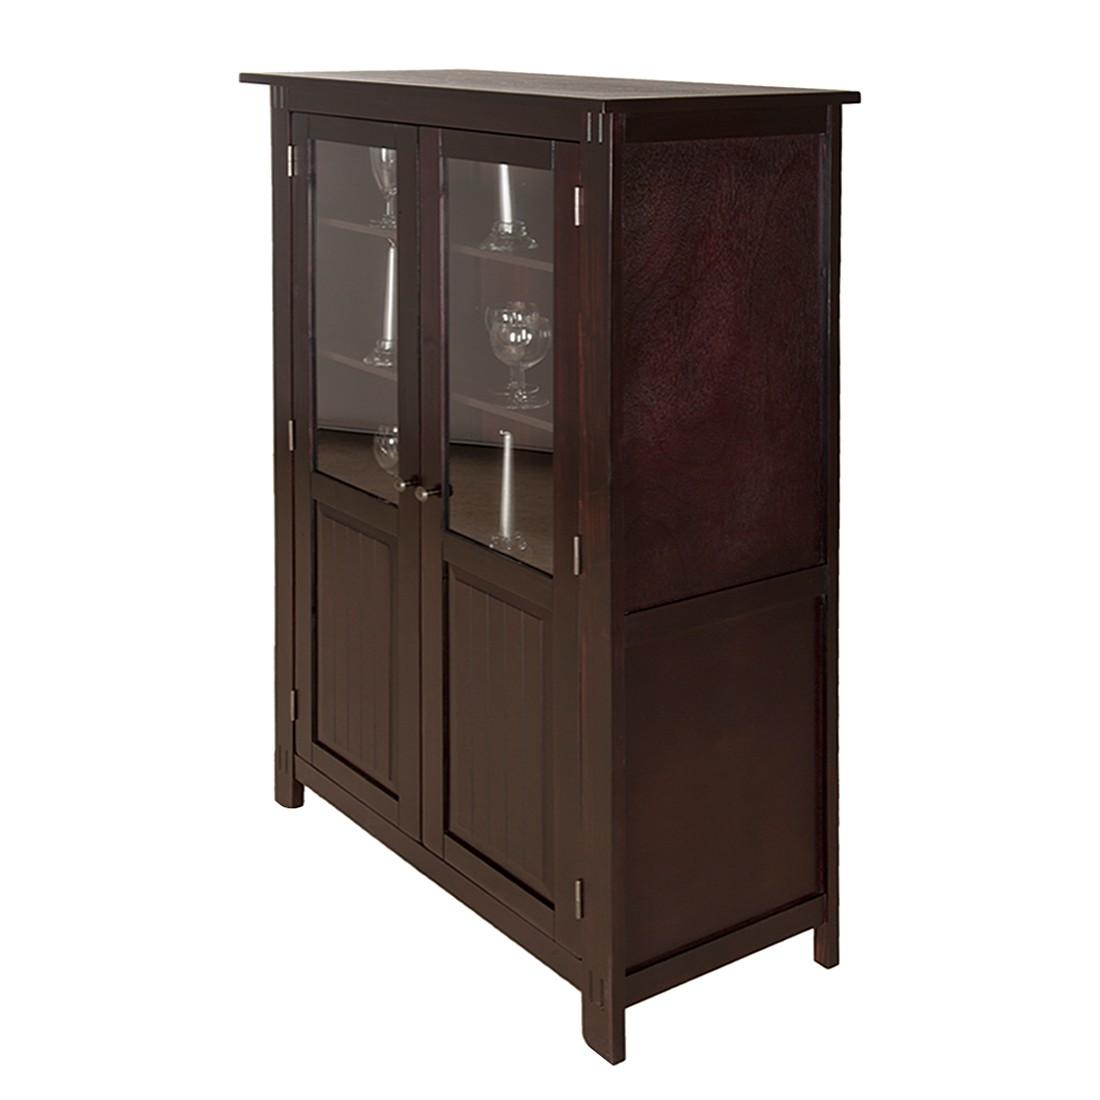 vitrinenschrank colomas pinie teilmassiv braun lackiert. Black Bedroom Furniture Sets. Home Design Ideas